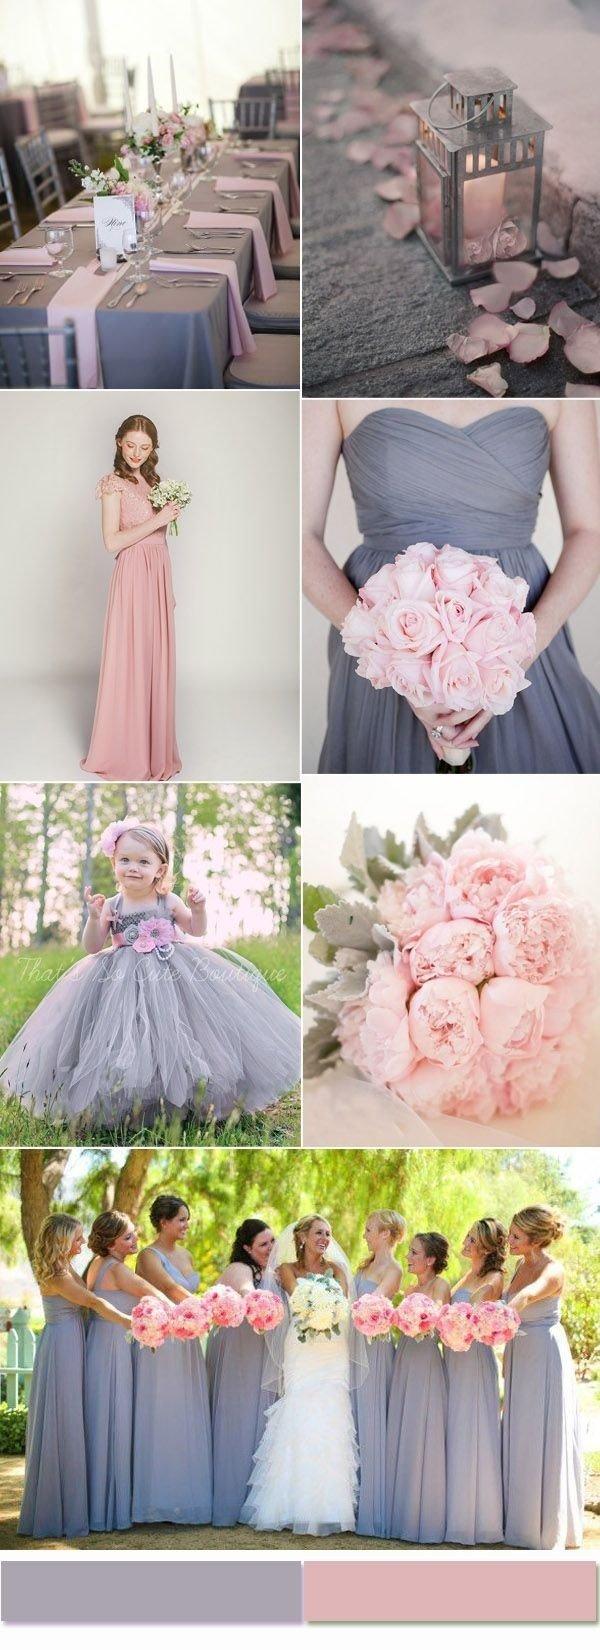 10 Perfect Wedding Theme Ideas For Spring